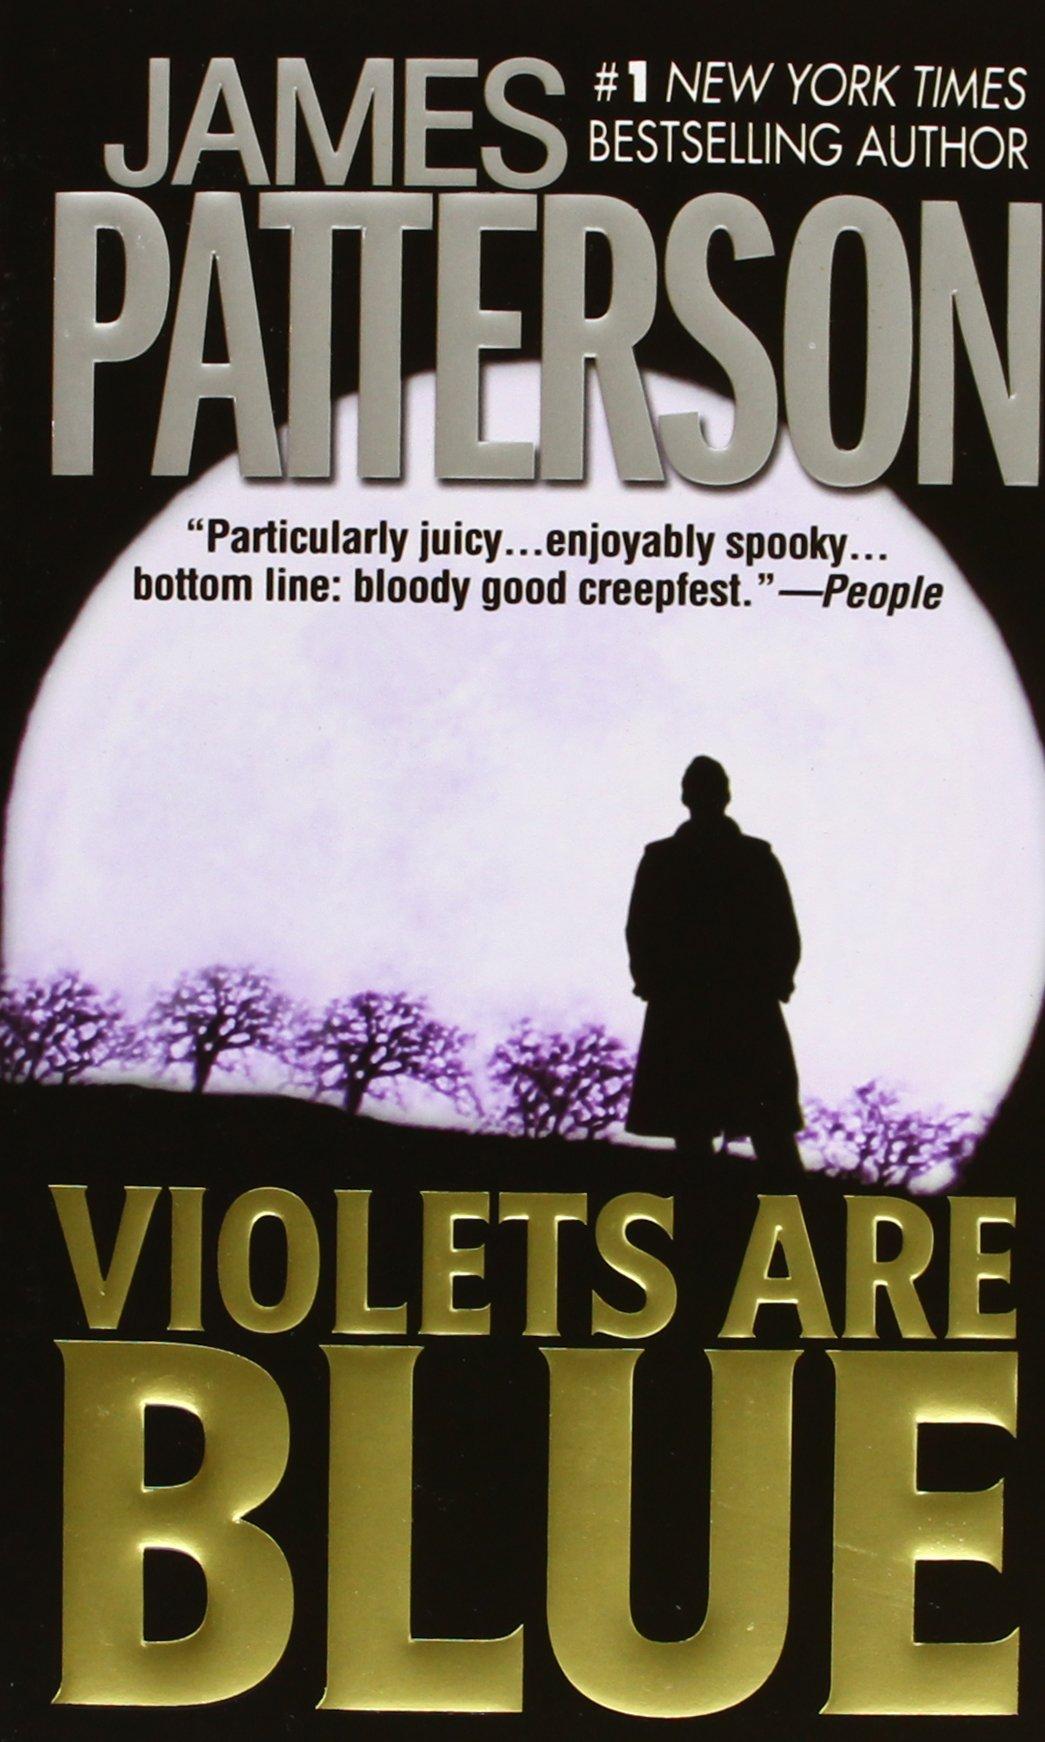 Image result for james patterson violets are blue